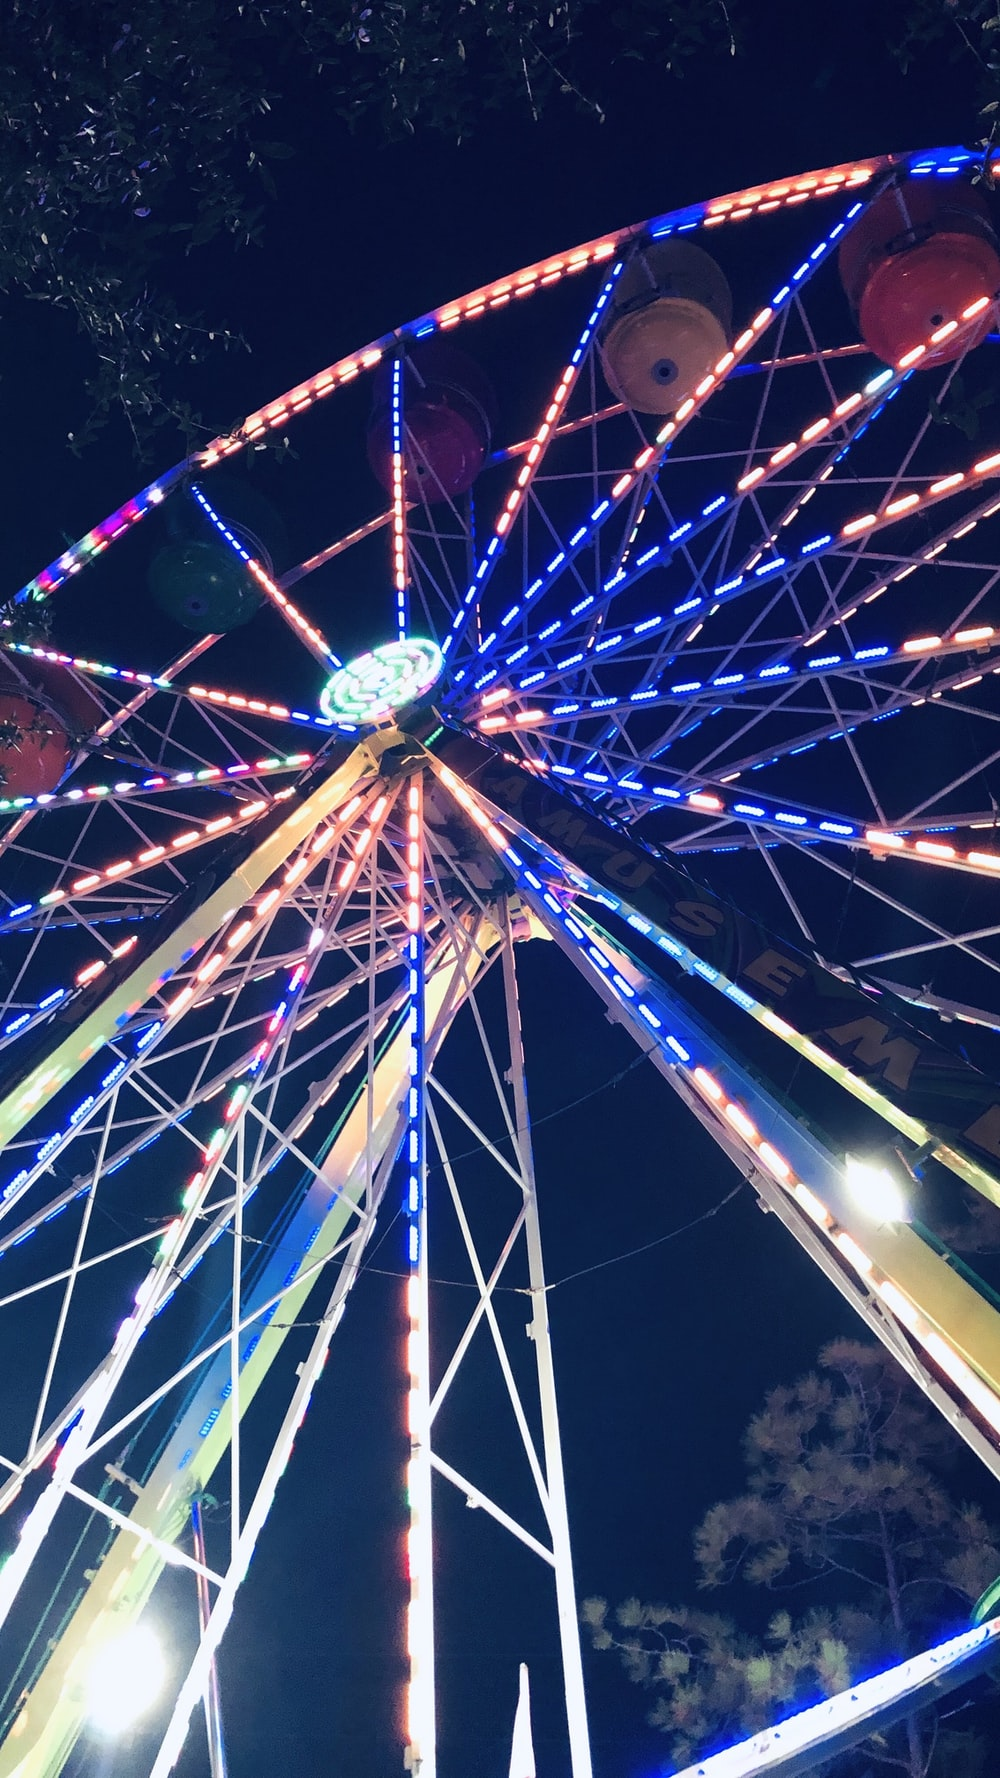 lighted ferris wheel